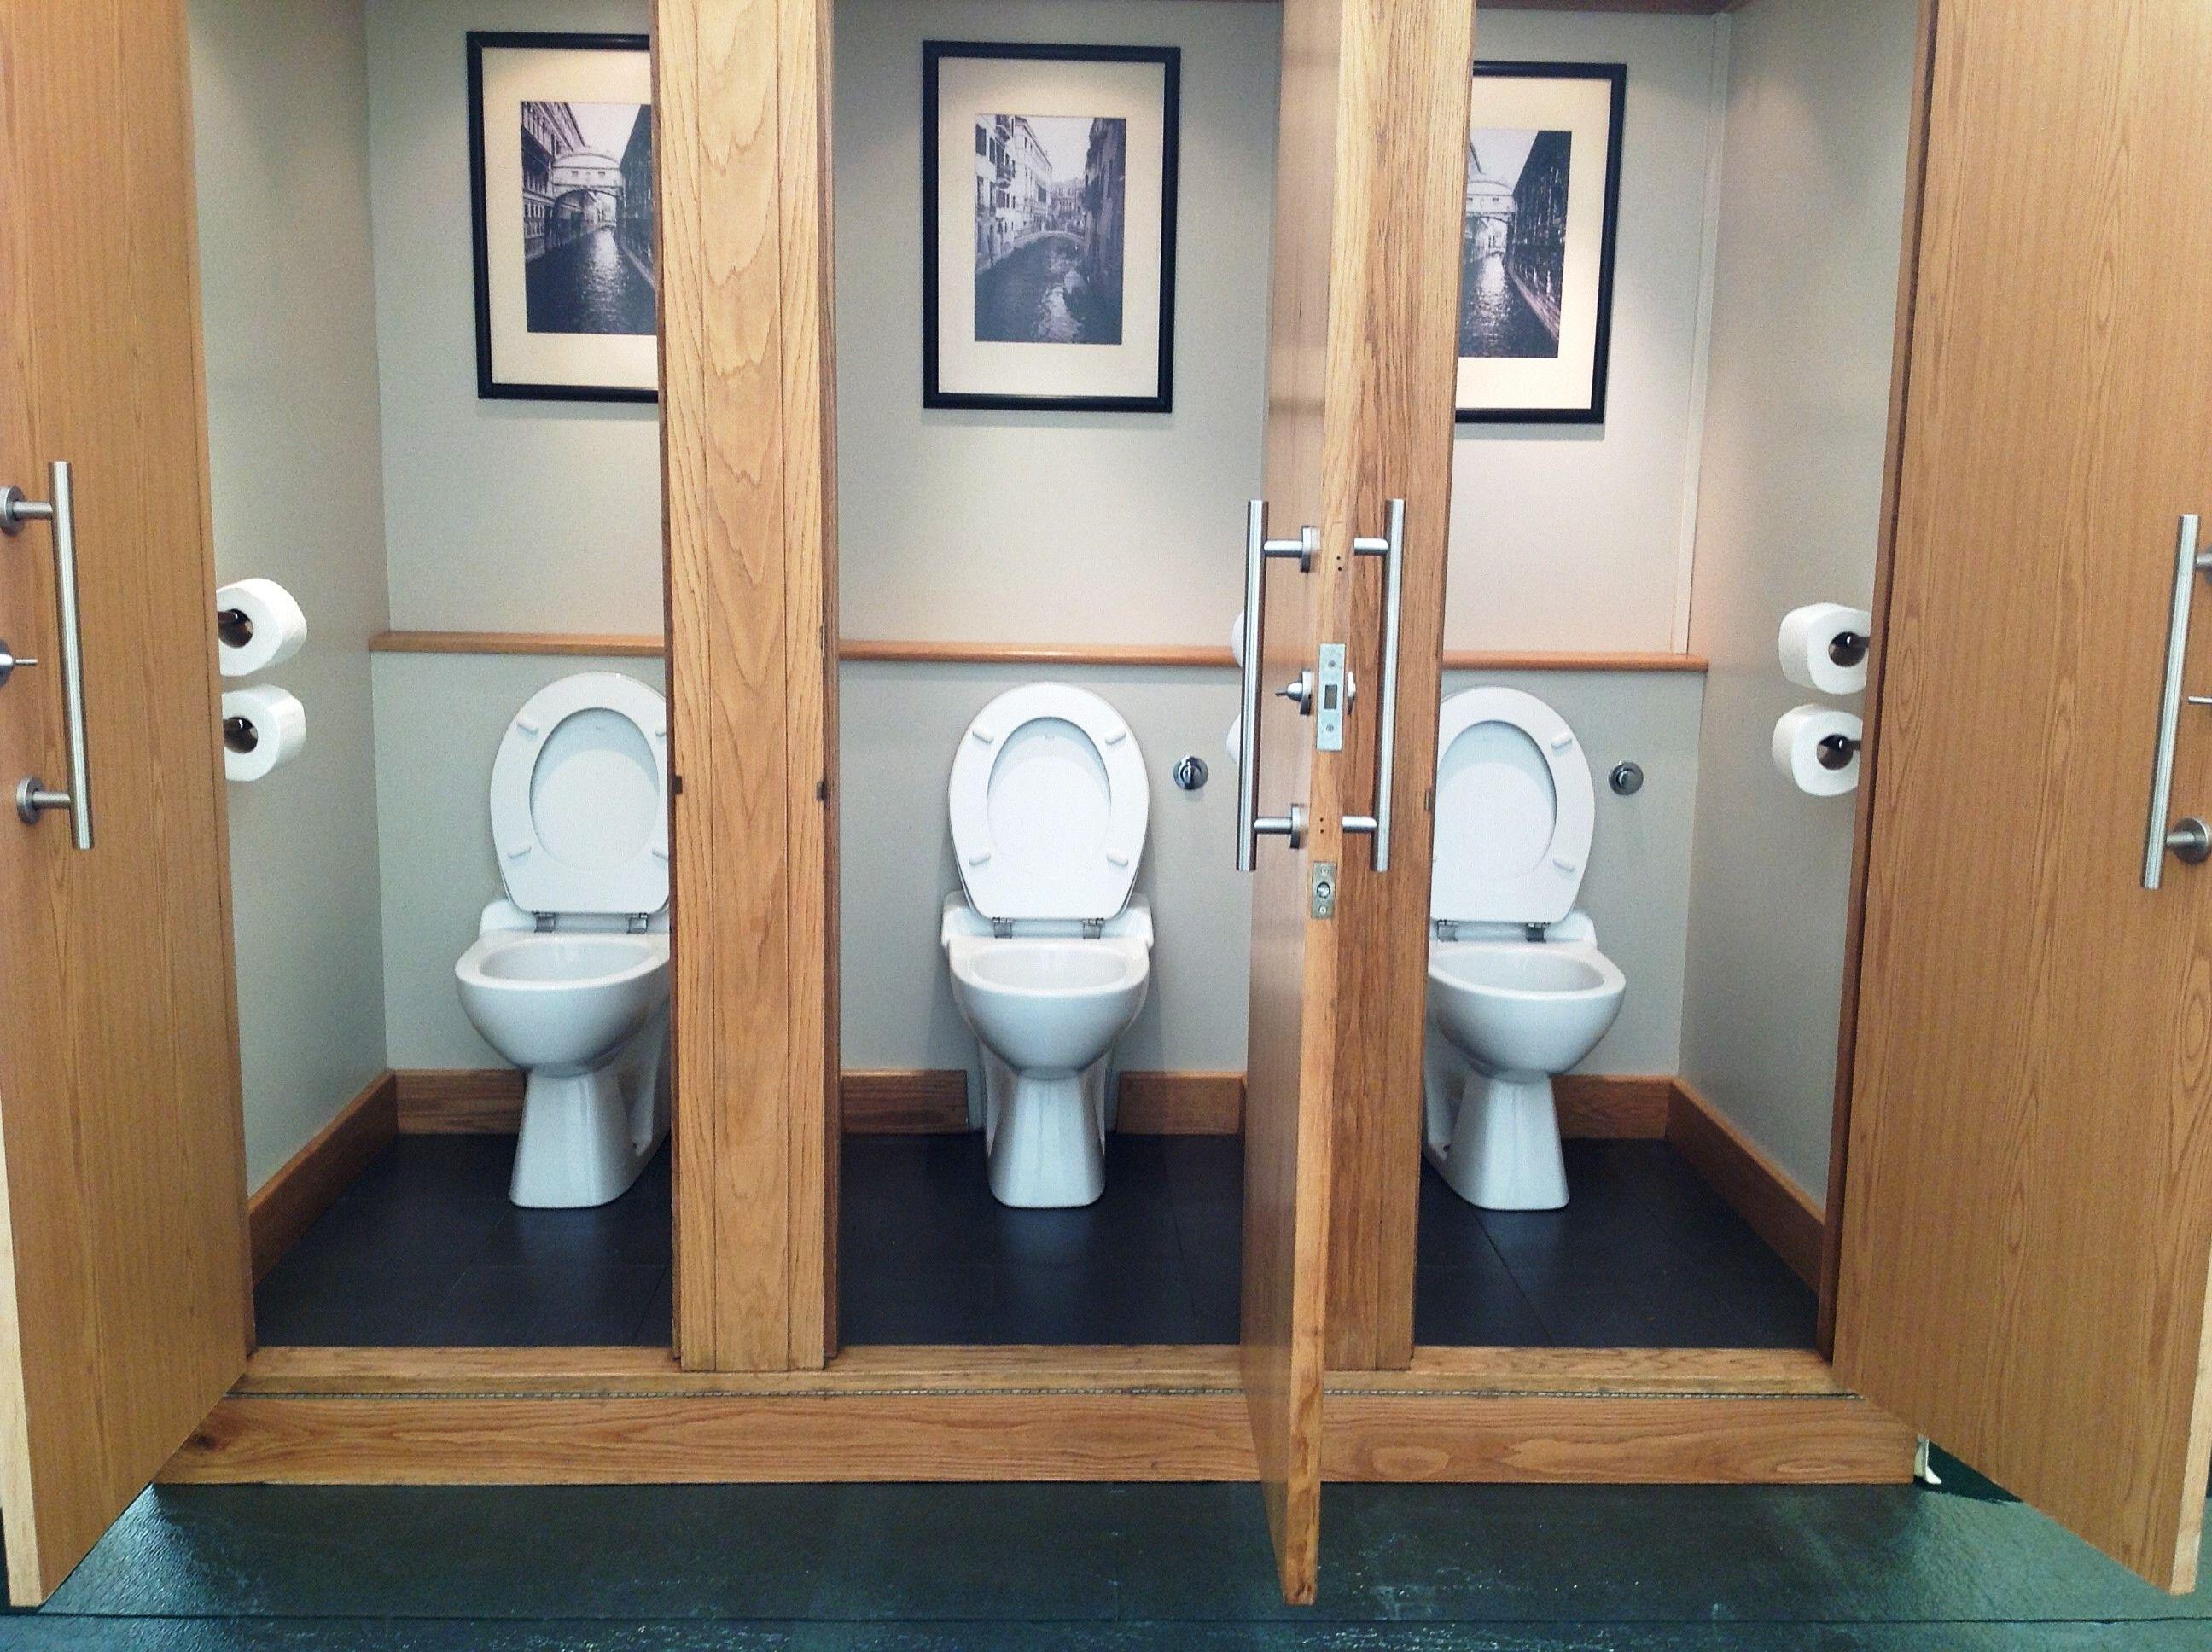 Luxury Moduvac Toilet Hire Portable Toilet Hire Vip Ladies Interior Toilet Hire For Weddings